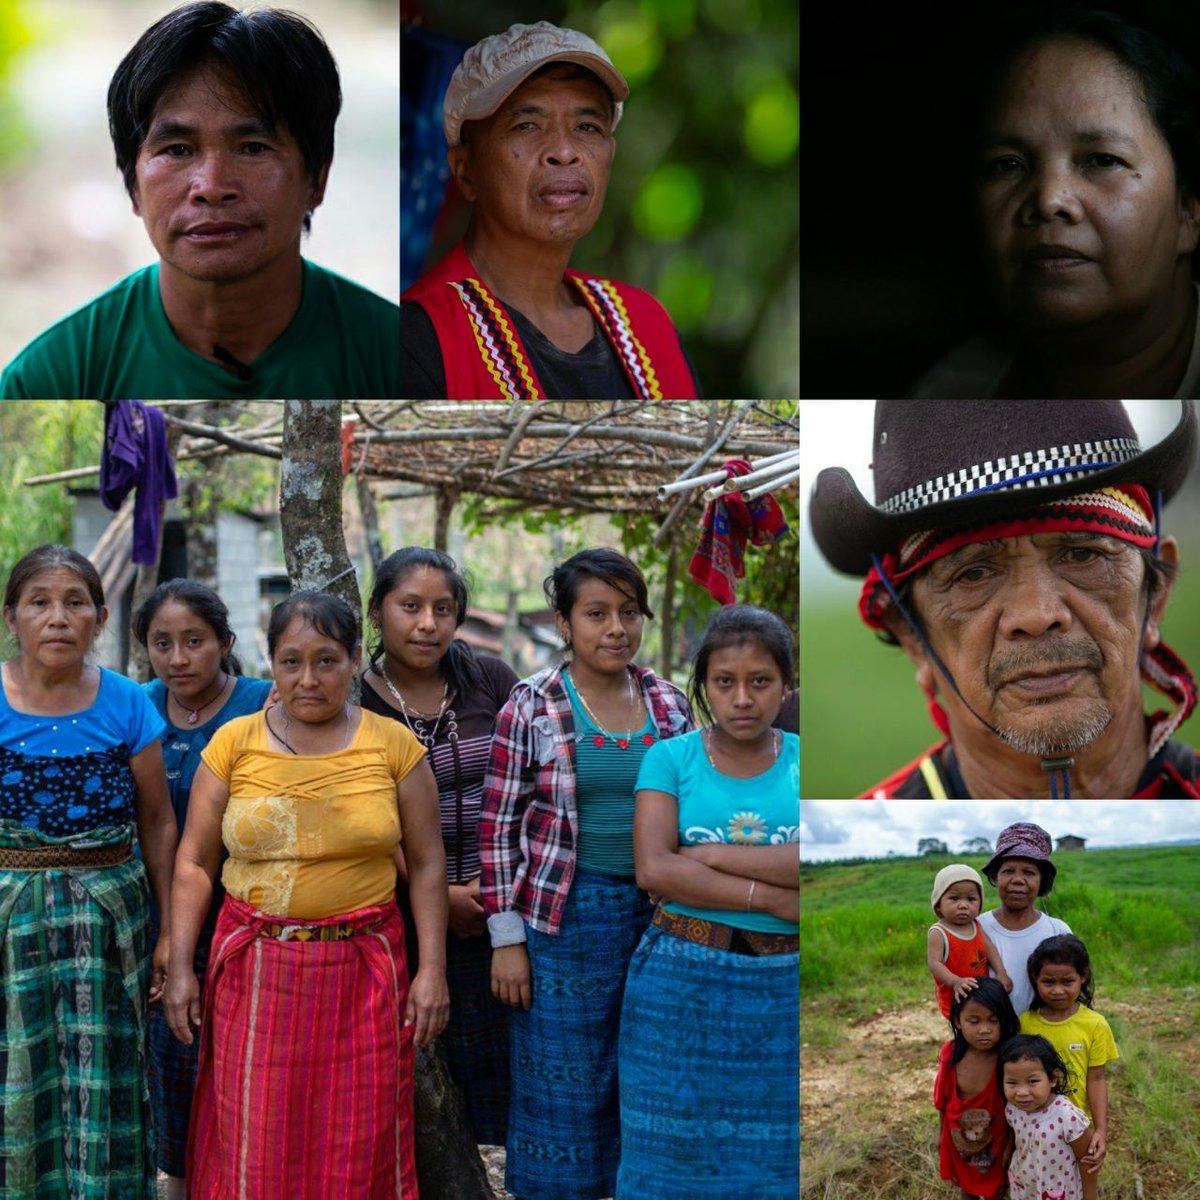 Philippines authorities respond to Global Witness report